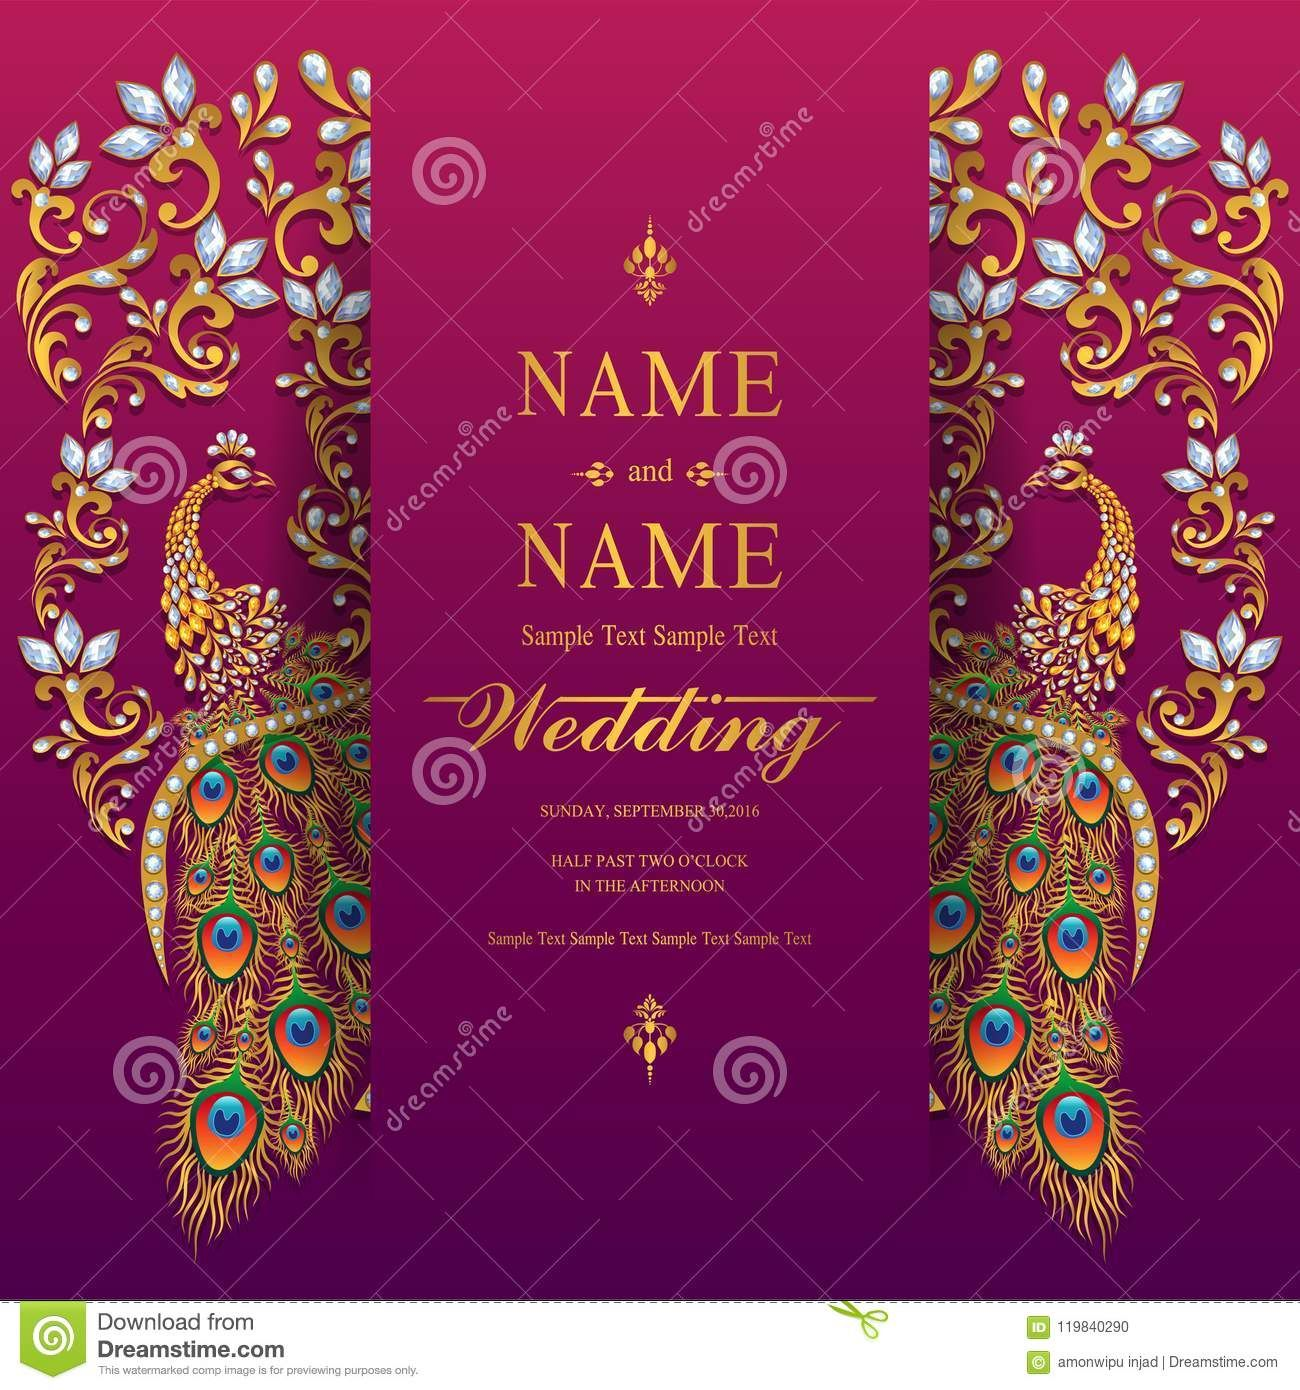 Wedding Invitation Card Templates Stock Vector Inside Indian Wedding Cards Design Templates In 2020 Wedding Card Design Wedding Invitation Card Template Indian Wedding Cards